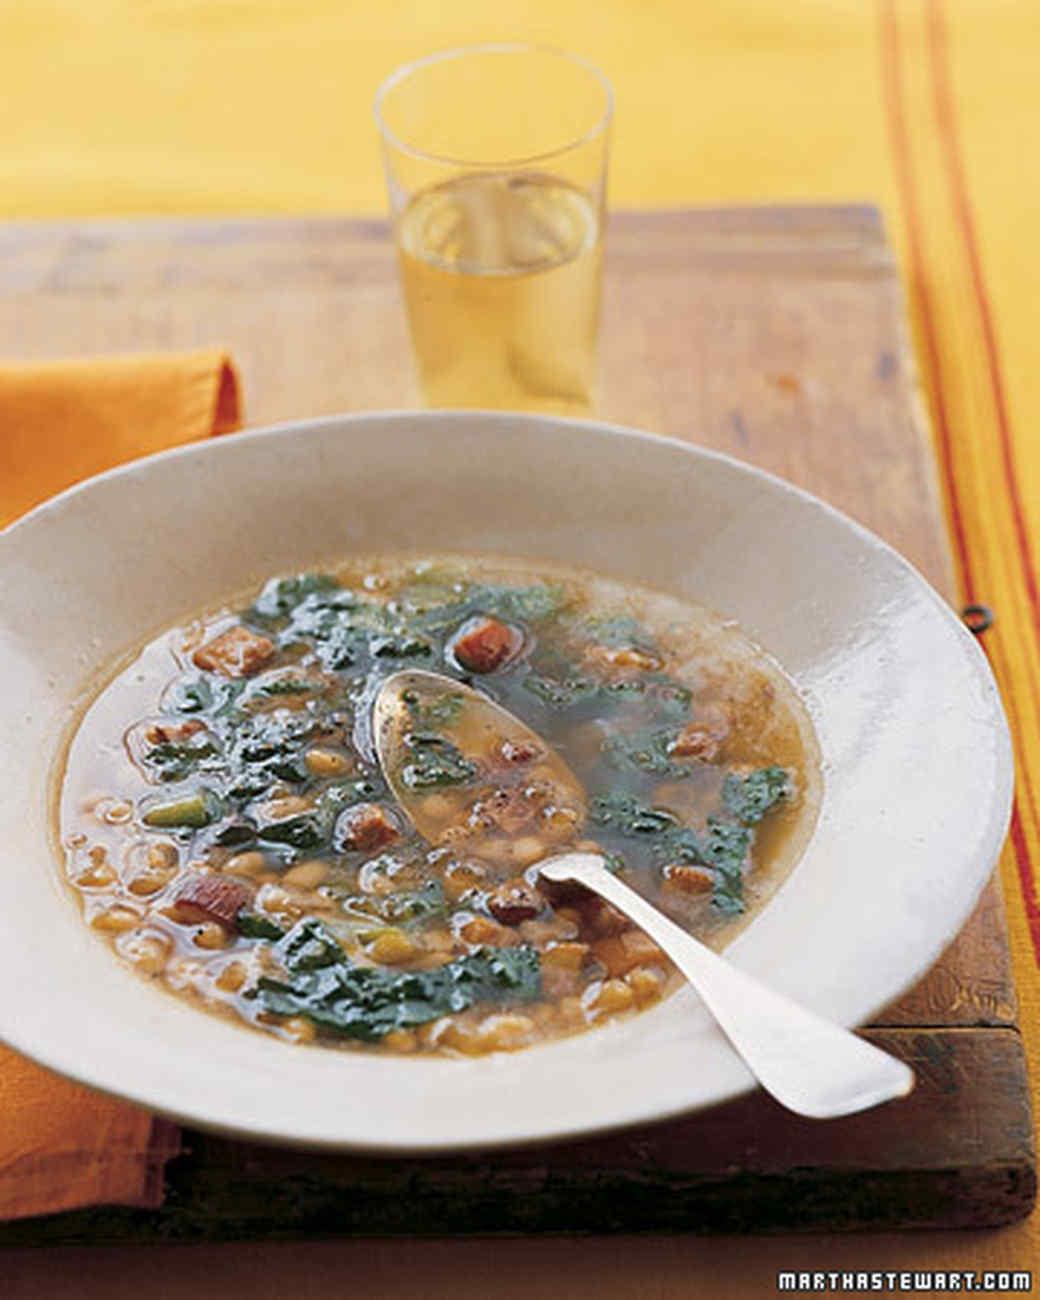 mla102661_0307_soup.jpg